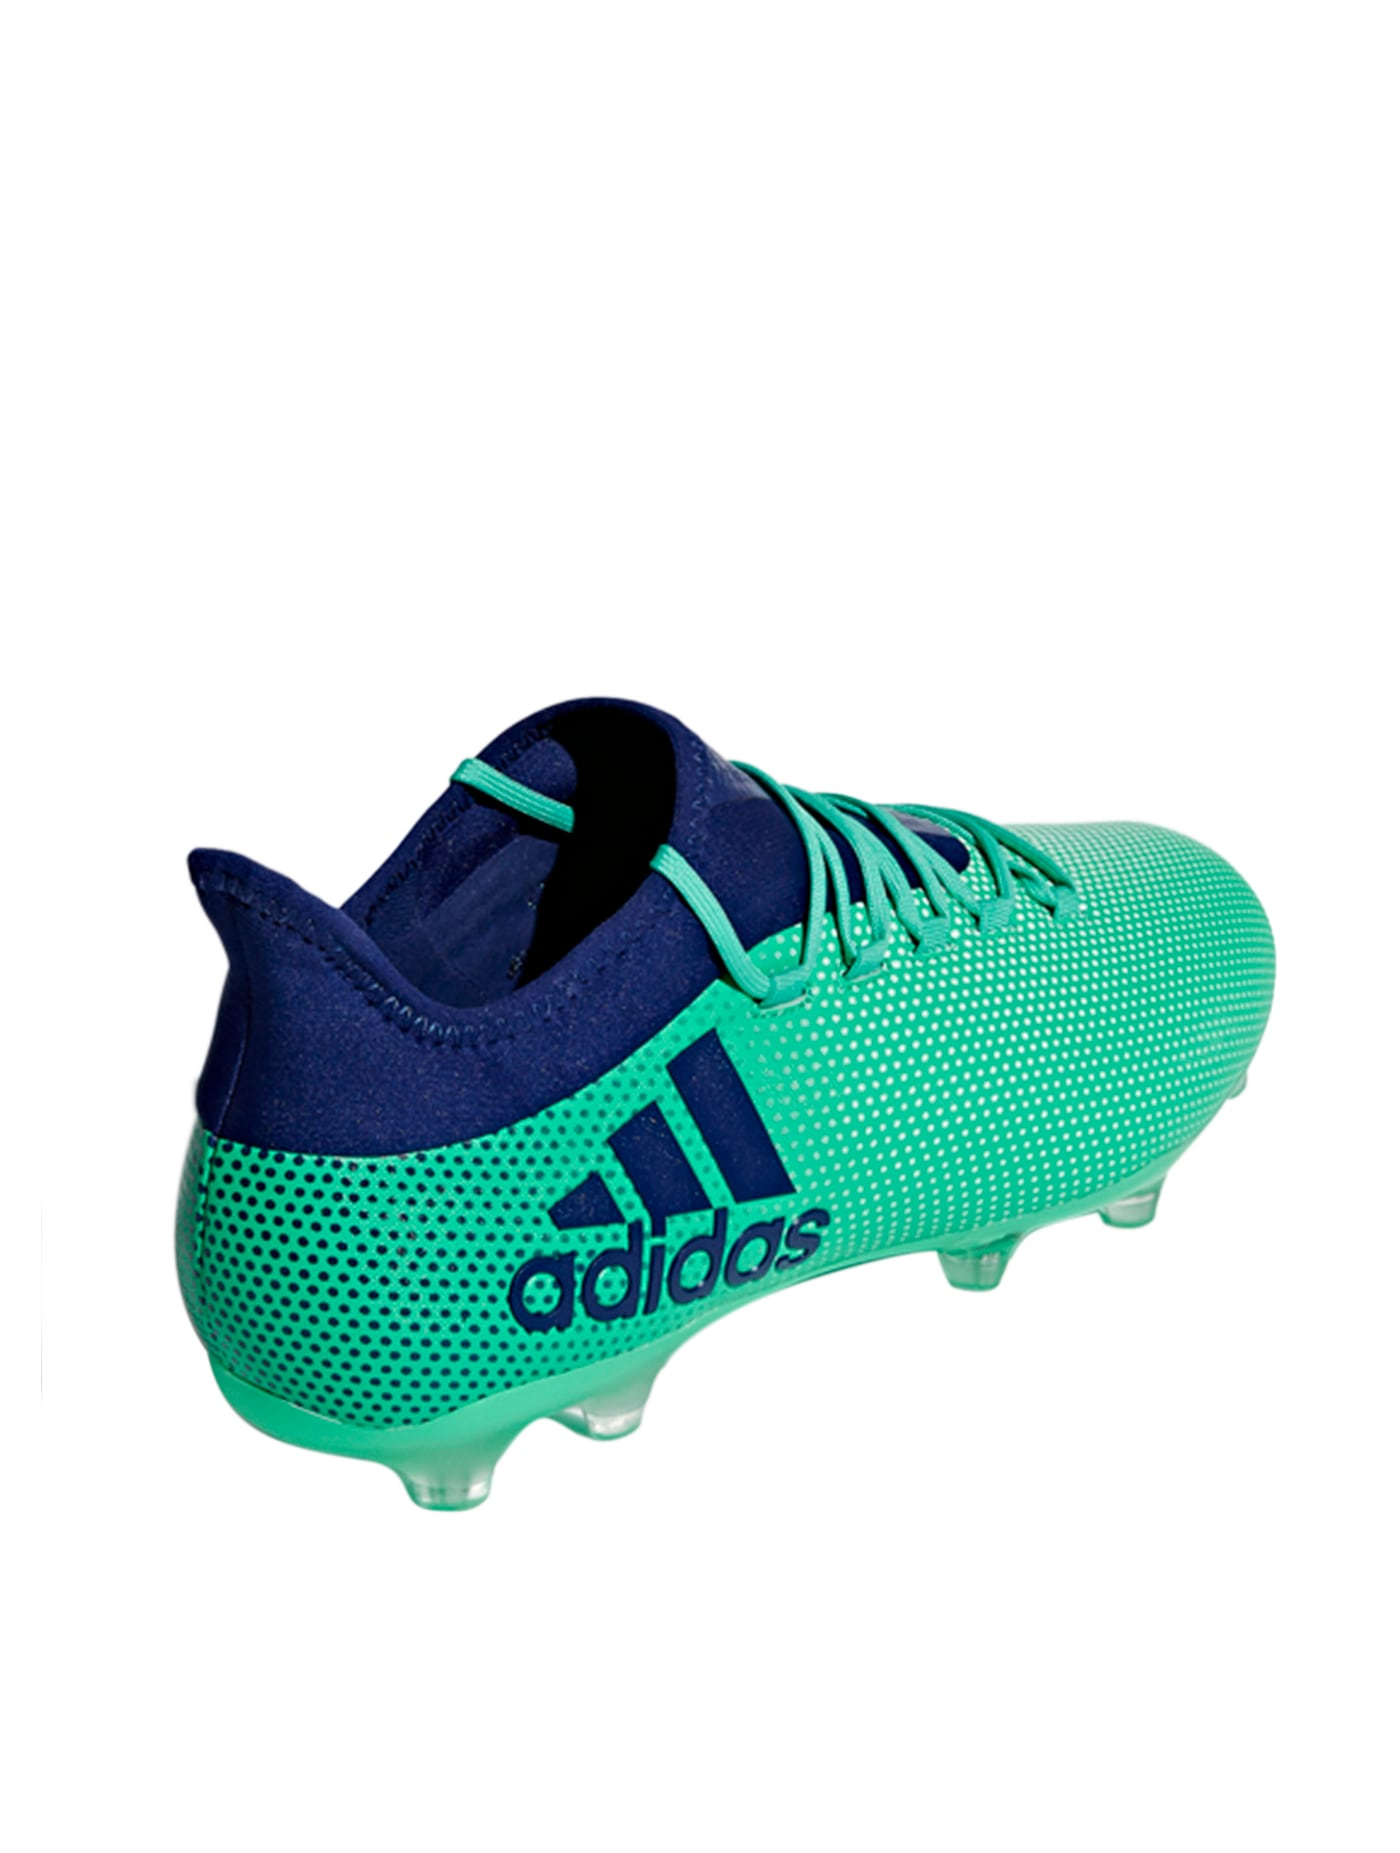 ADIDAS รองเท้าฟุตบอลผู้ชาย รุ่น X 17.2 Firm Ground CP9